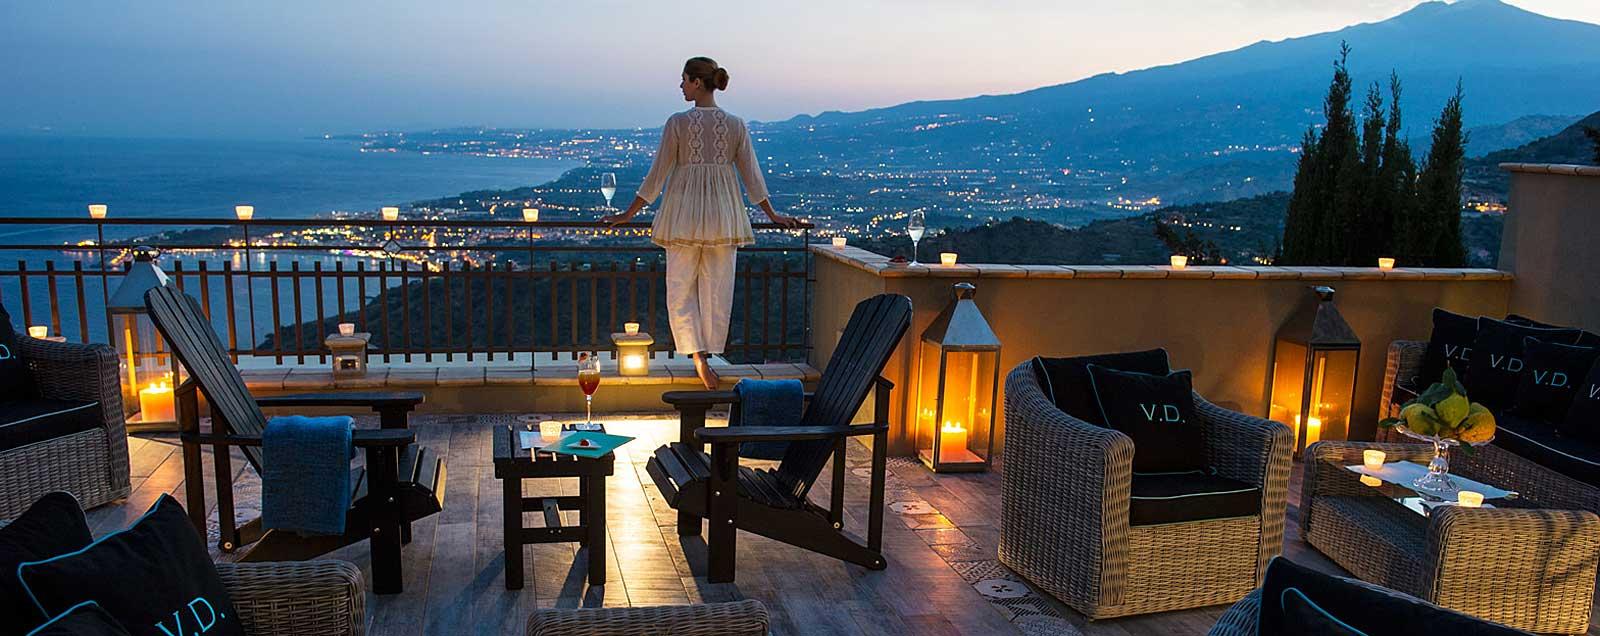 Villa Ducale Boutique Hotel Taormina, Sicile (terrasse panoramique)